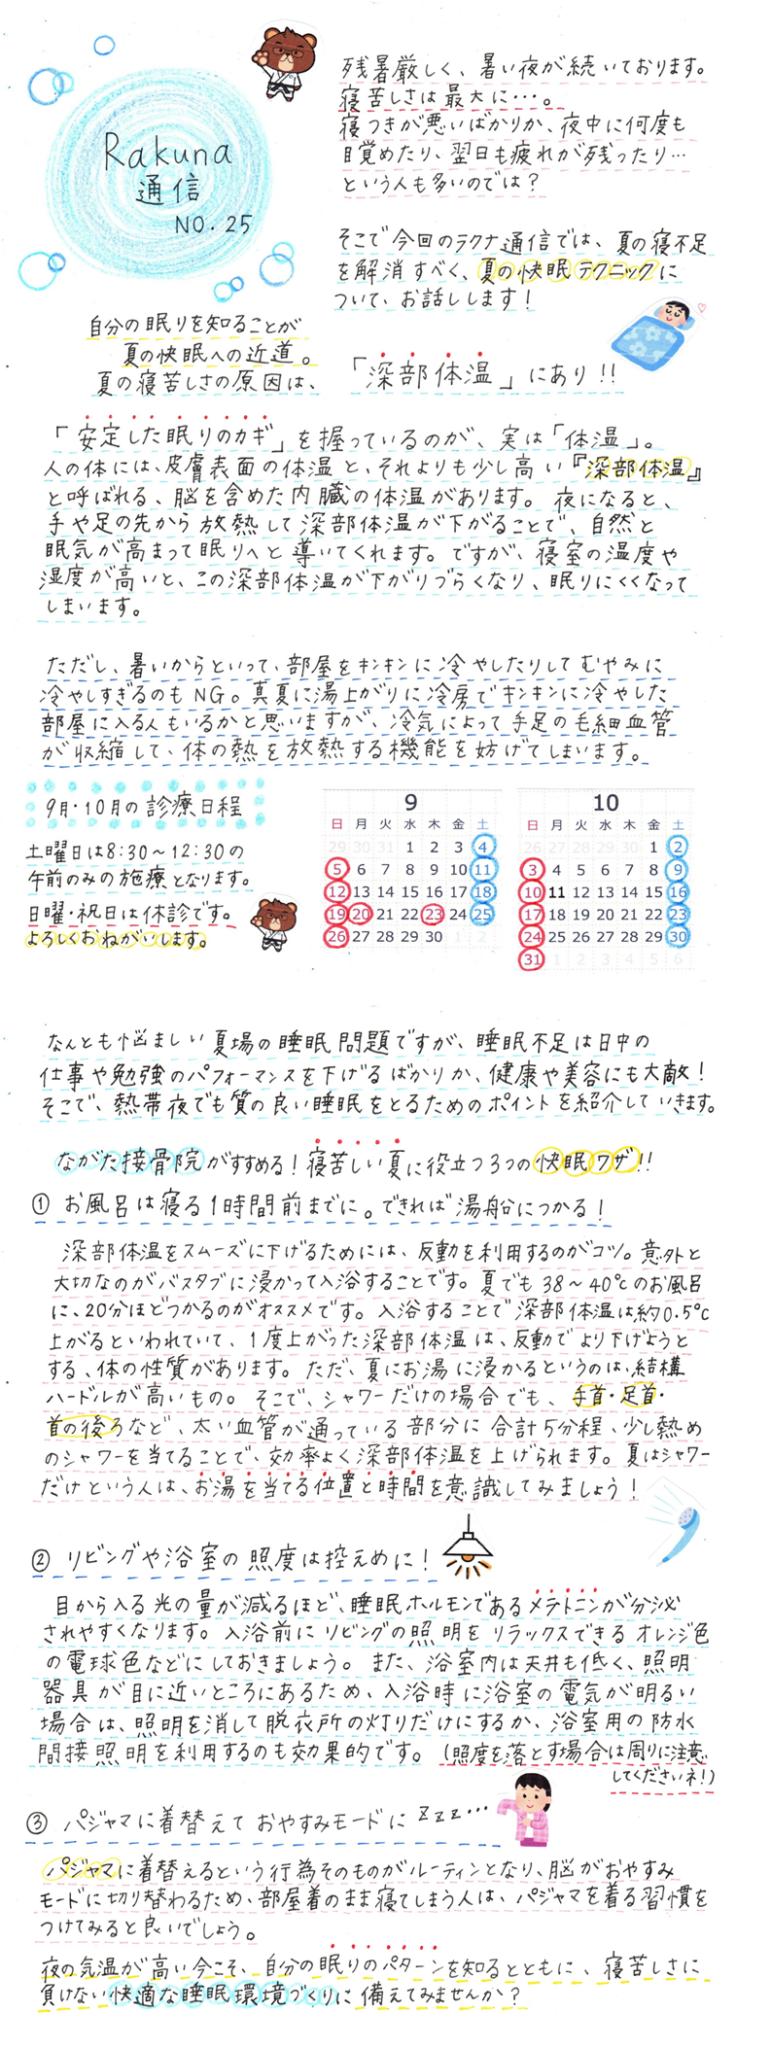 Rakuna~通信25